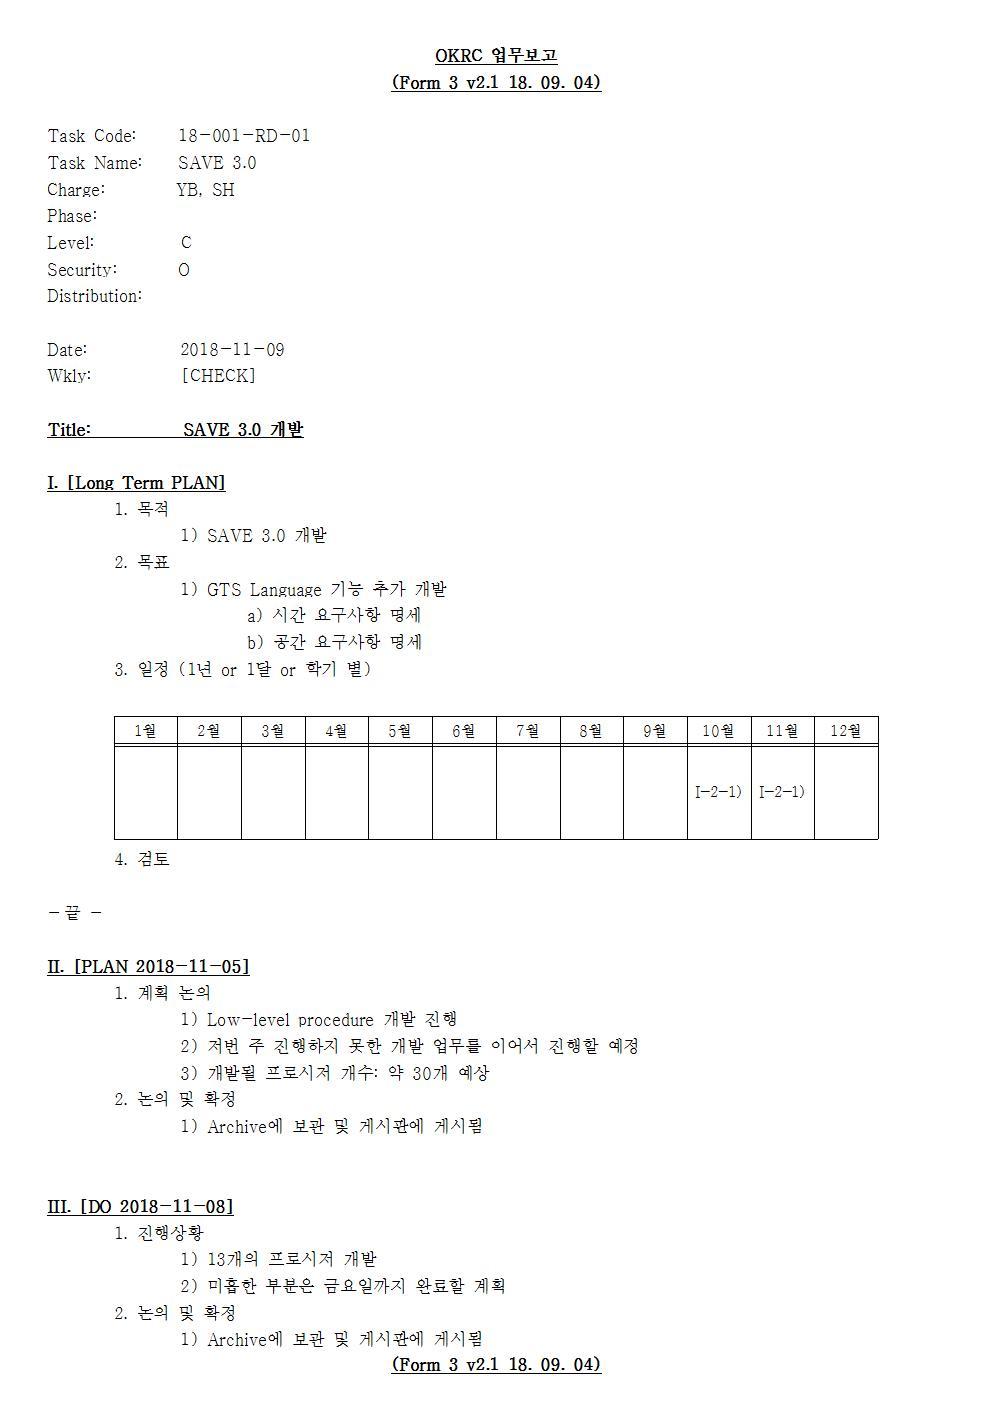 D-[18-001-RD-01]-[SAVE 3.0]-[2018-11-09][SH]001.jpg